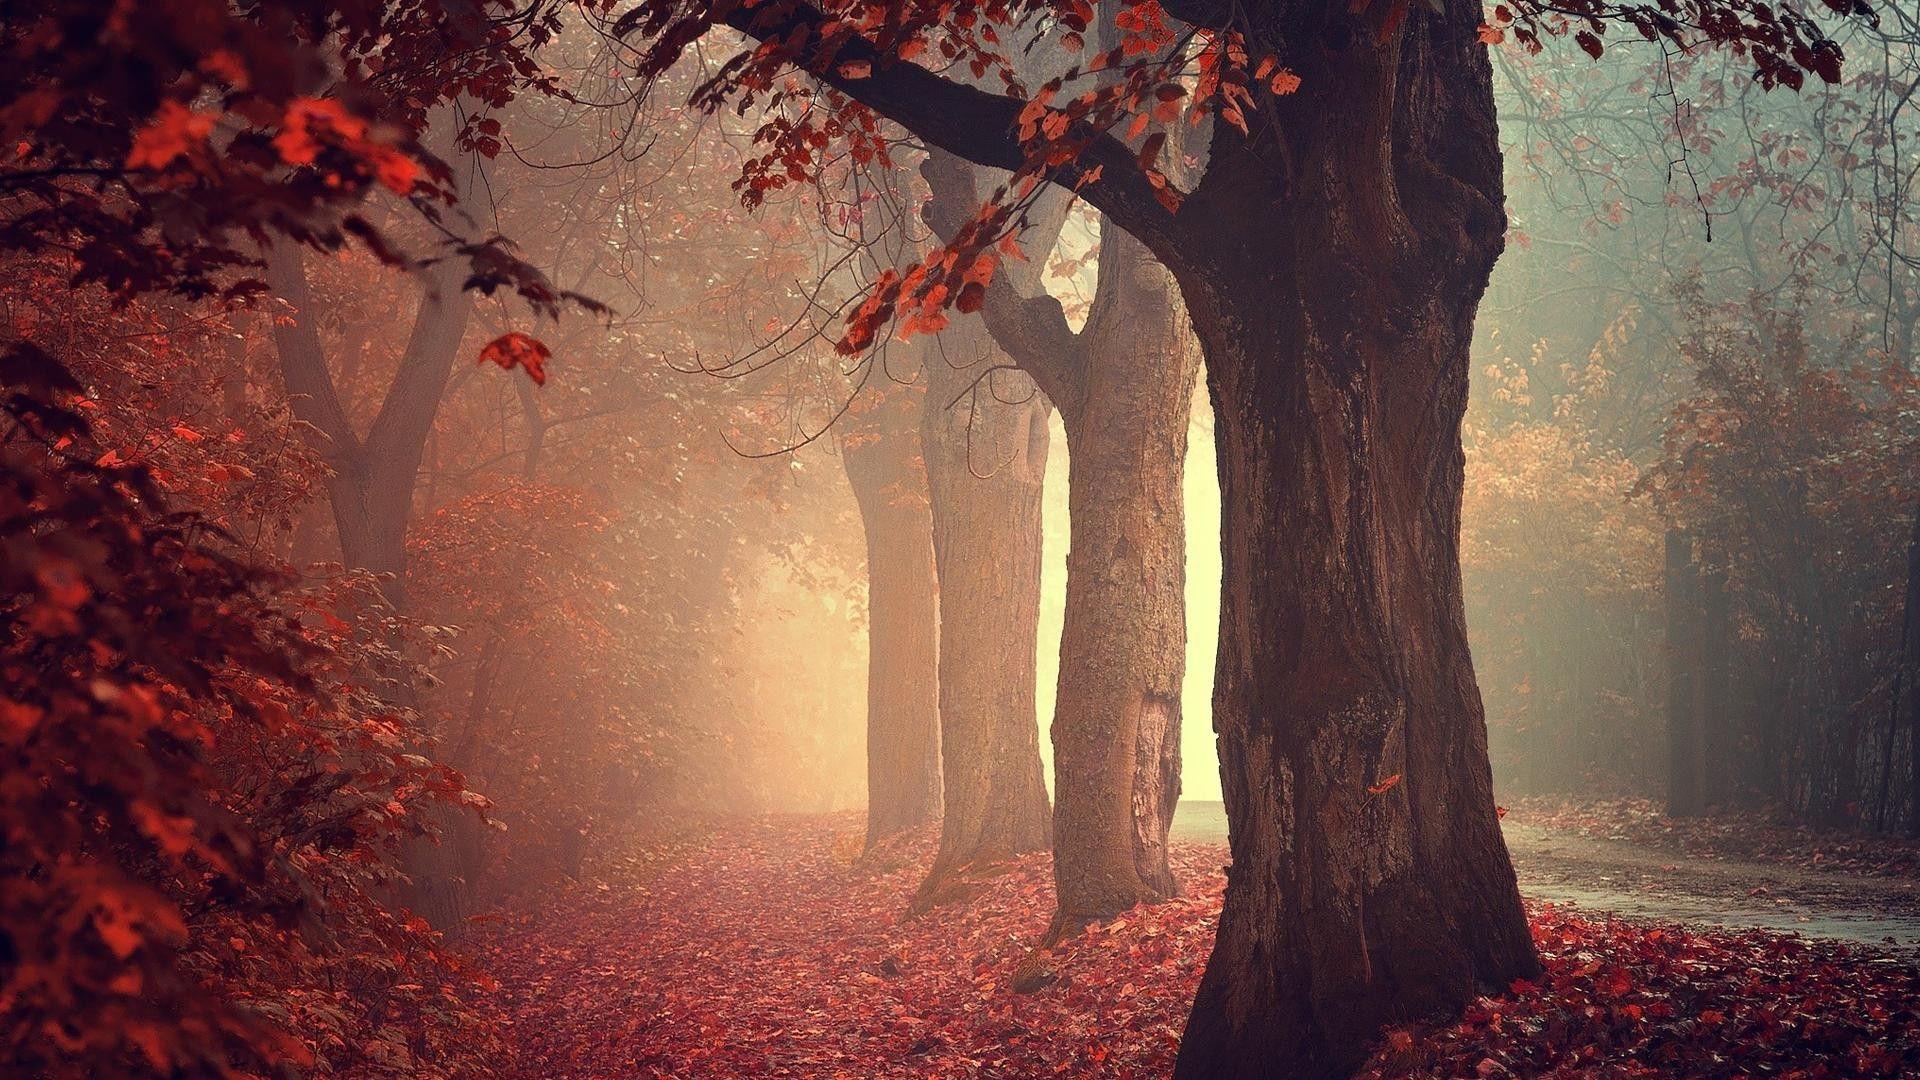 C'est l'automne...  3a994d60f23ee4c6c4fb50dcee1fa561